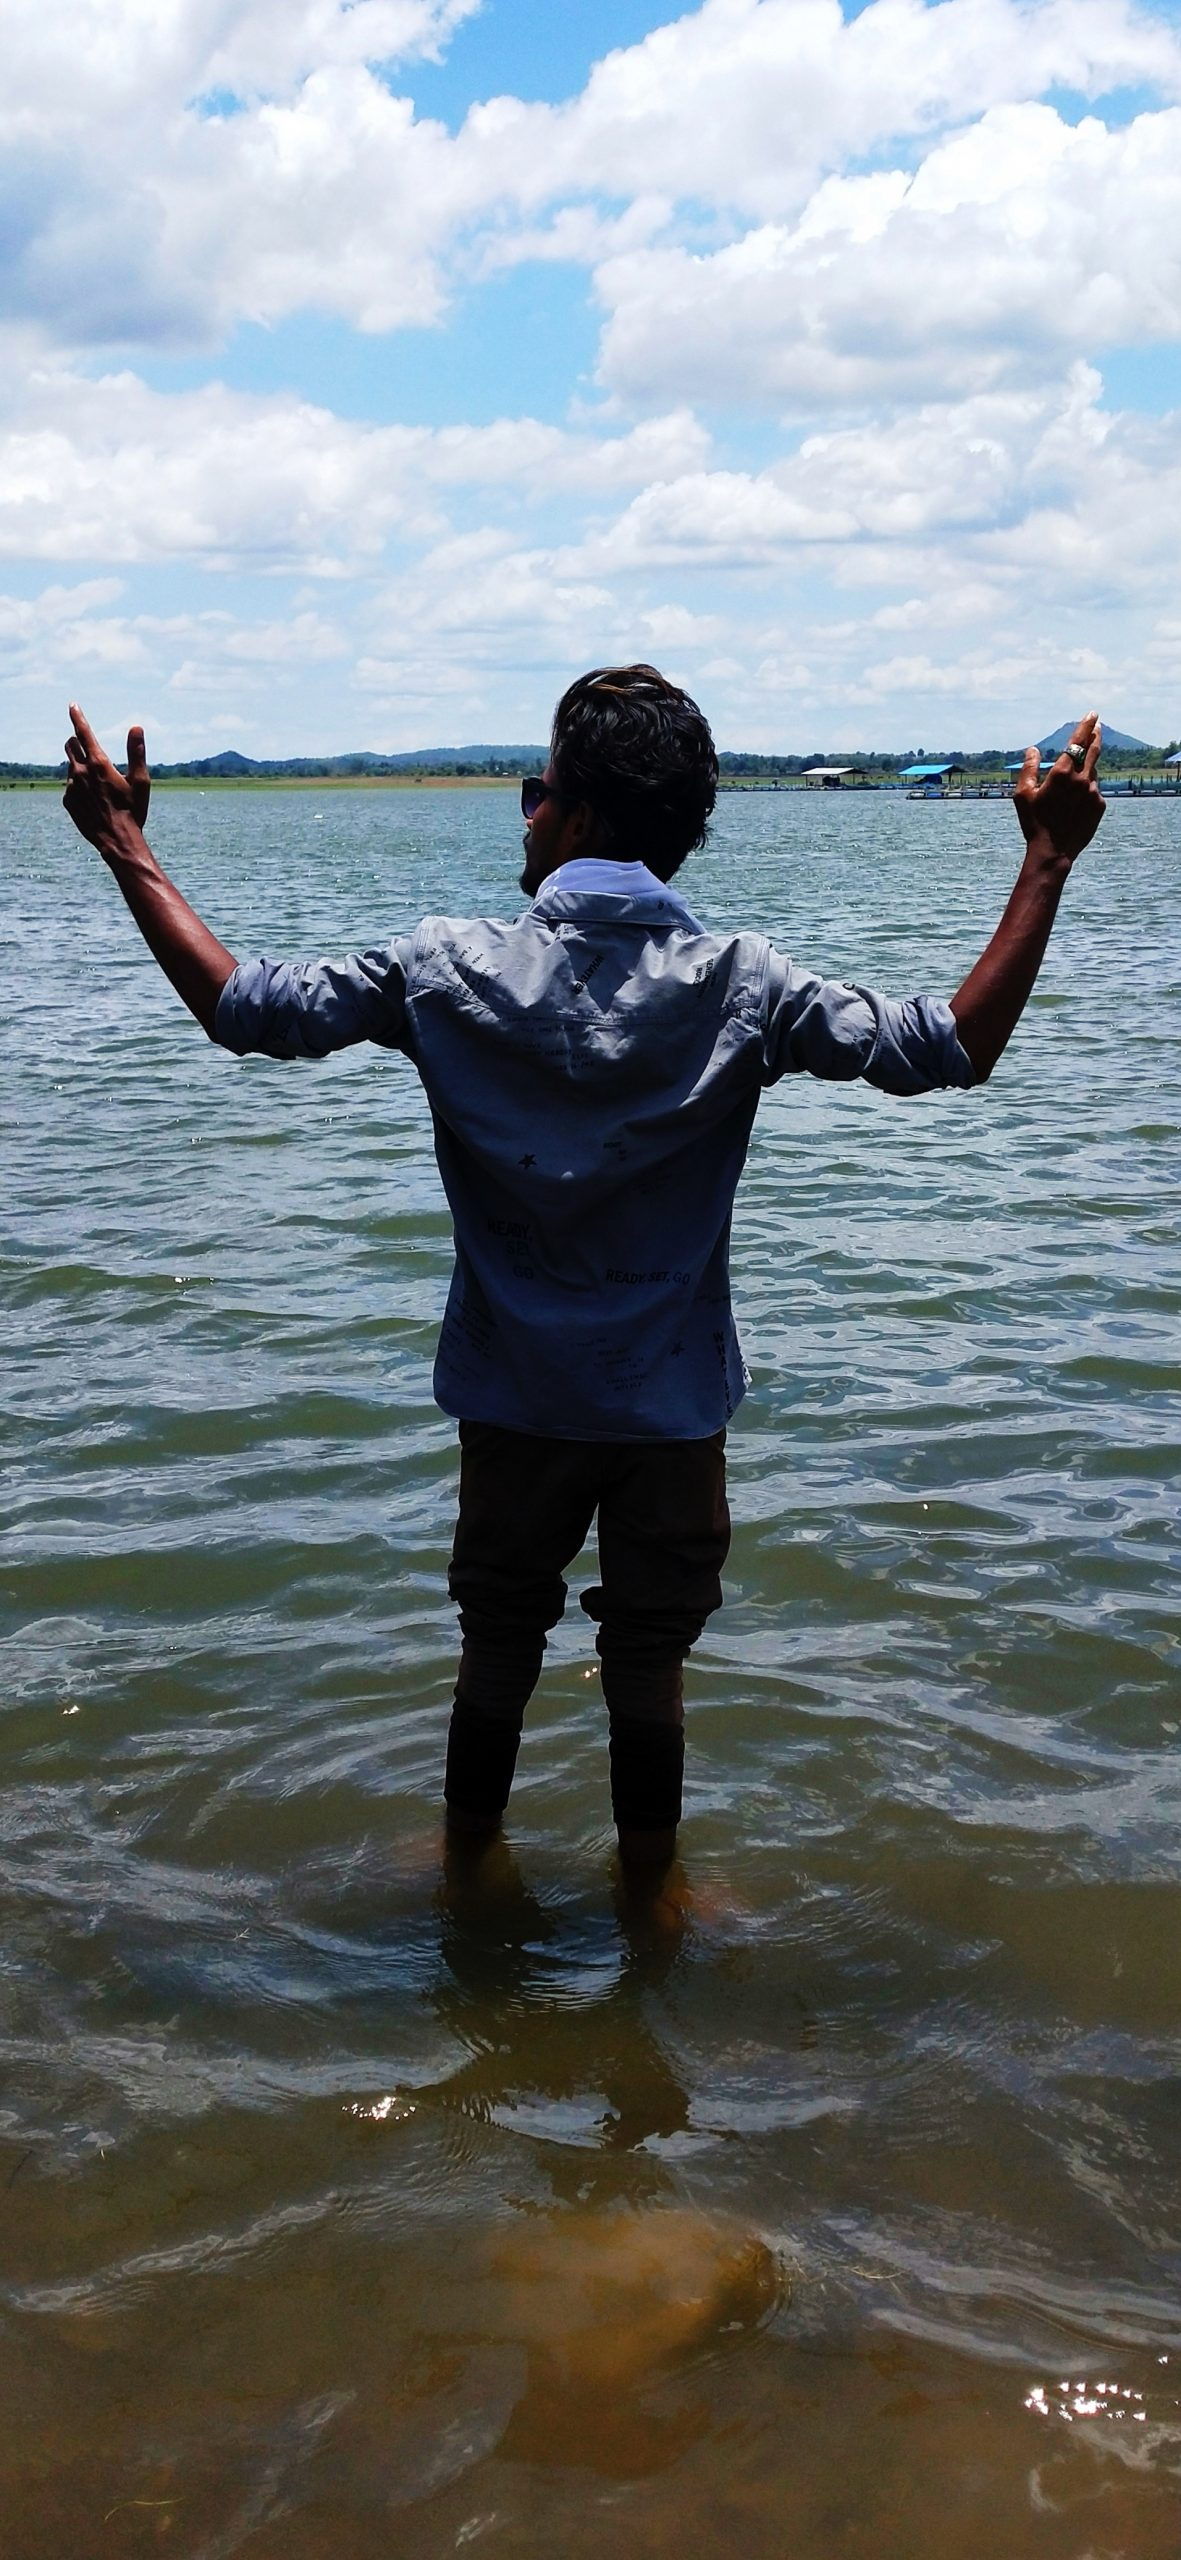 A boy enjoying in water